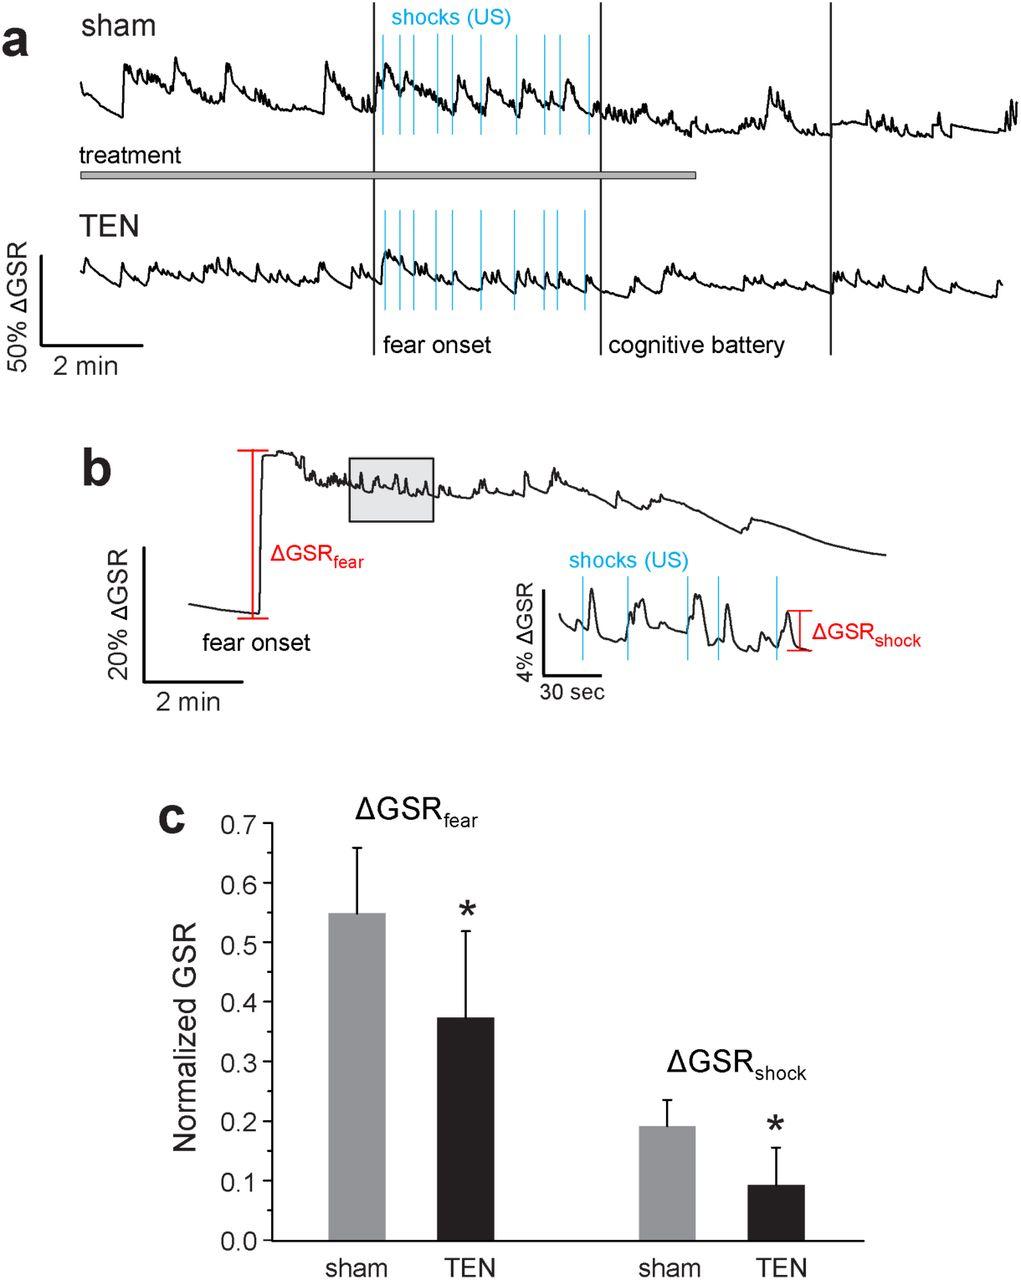 Transdermal neuromodulation of noradrenergic activity suppresses